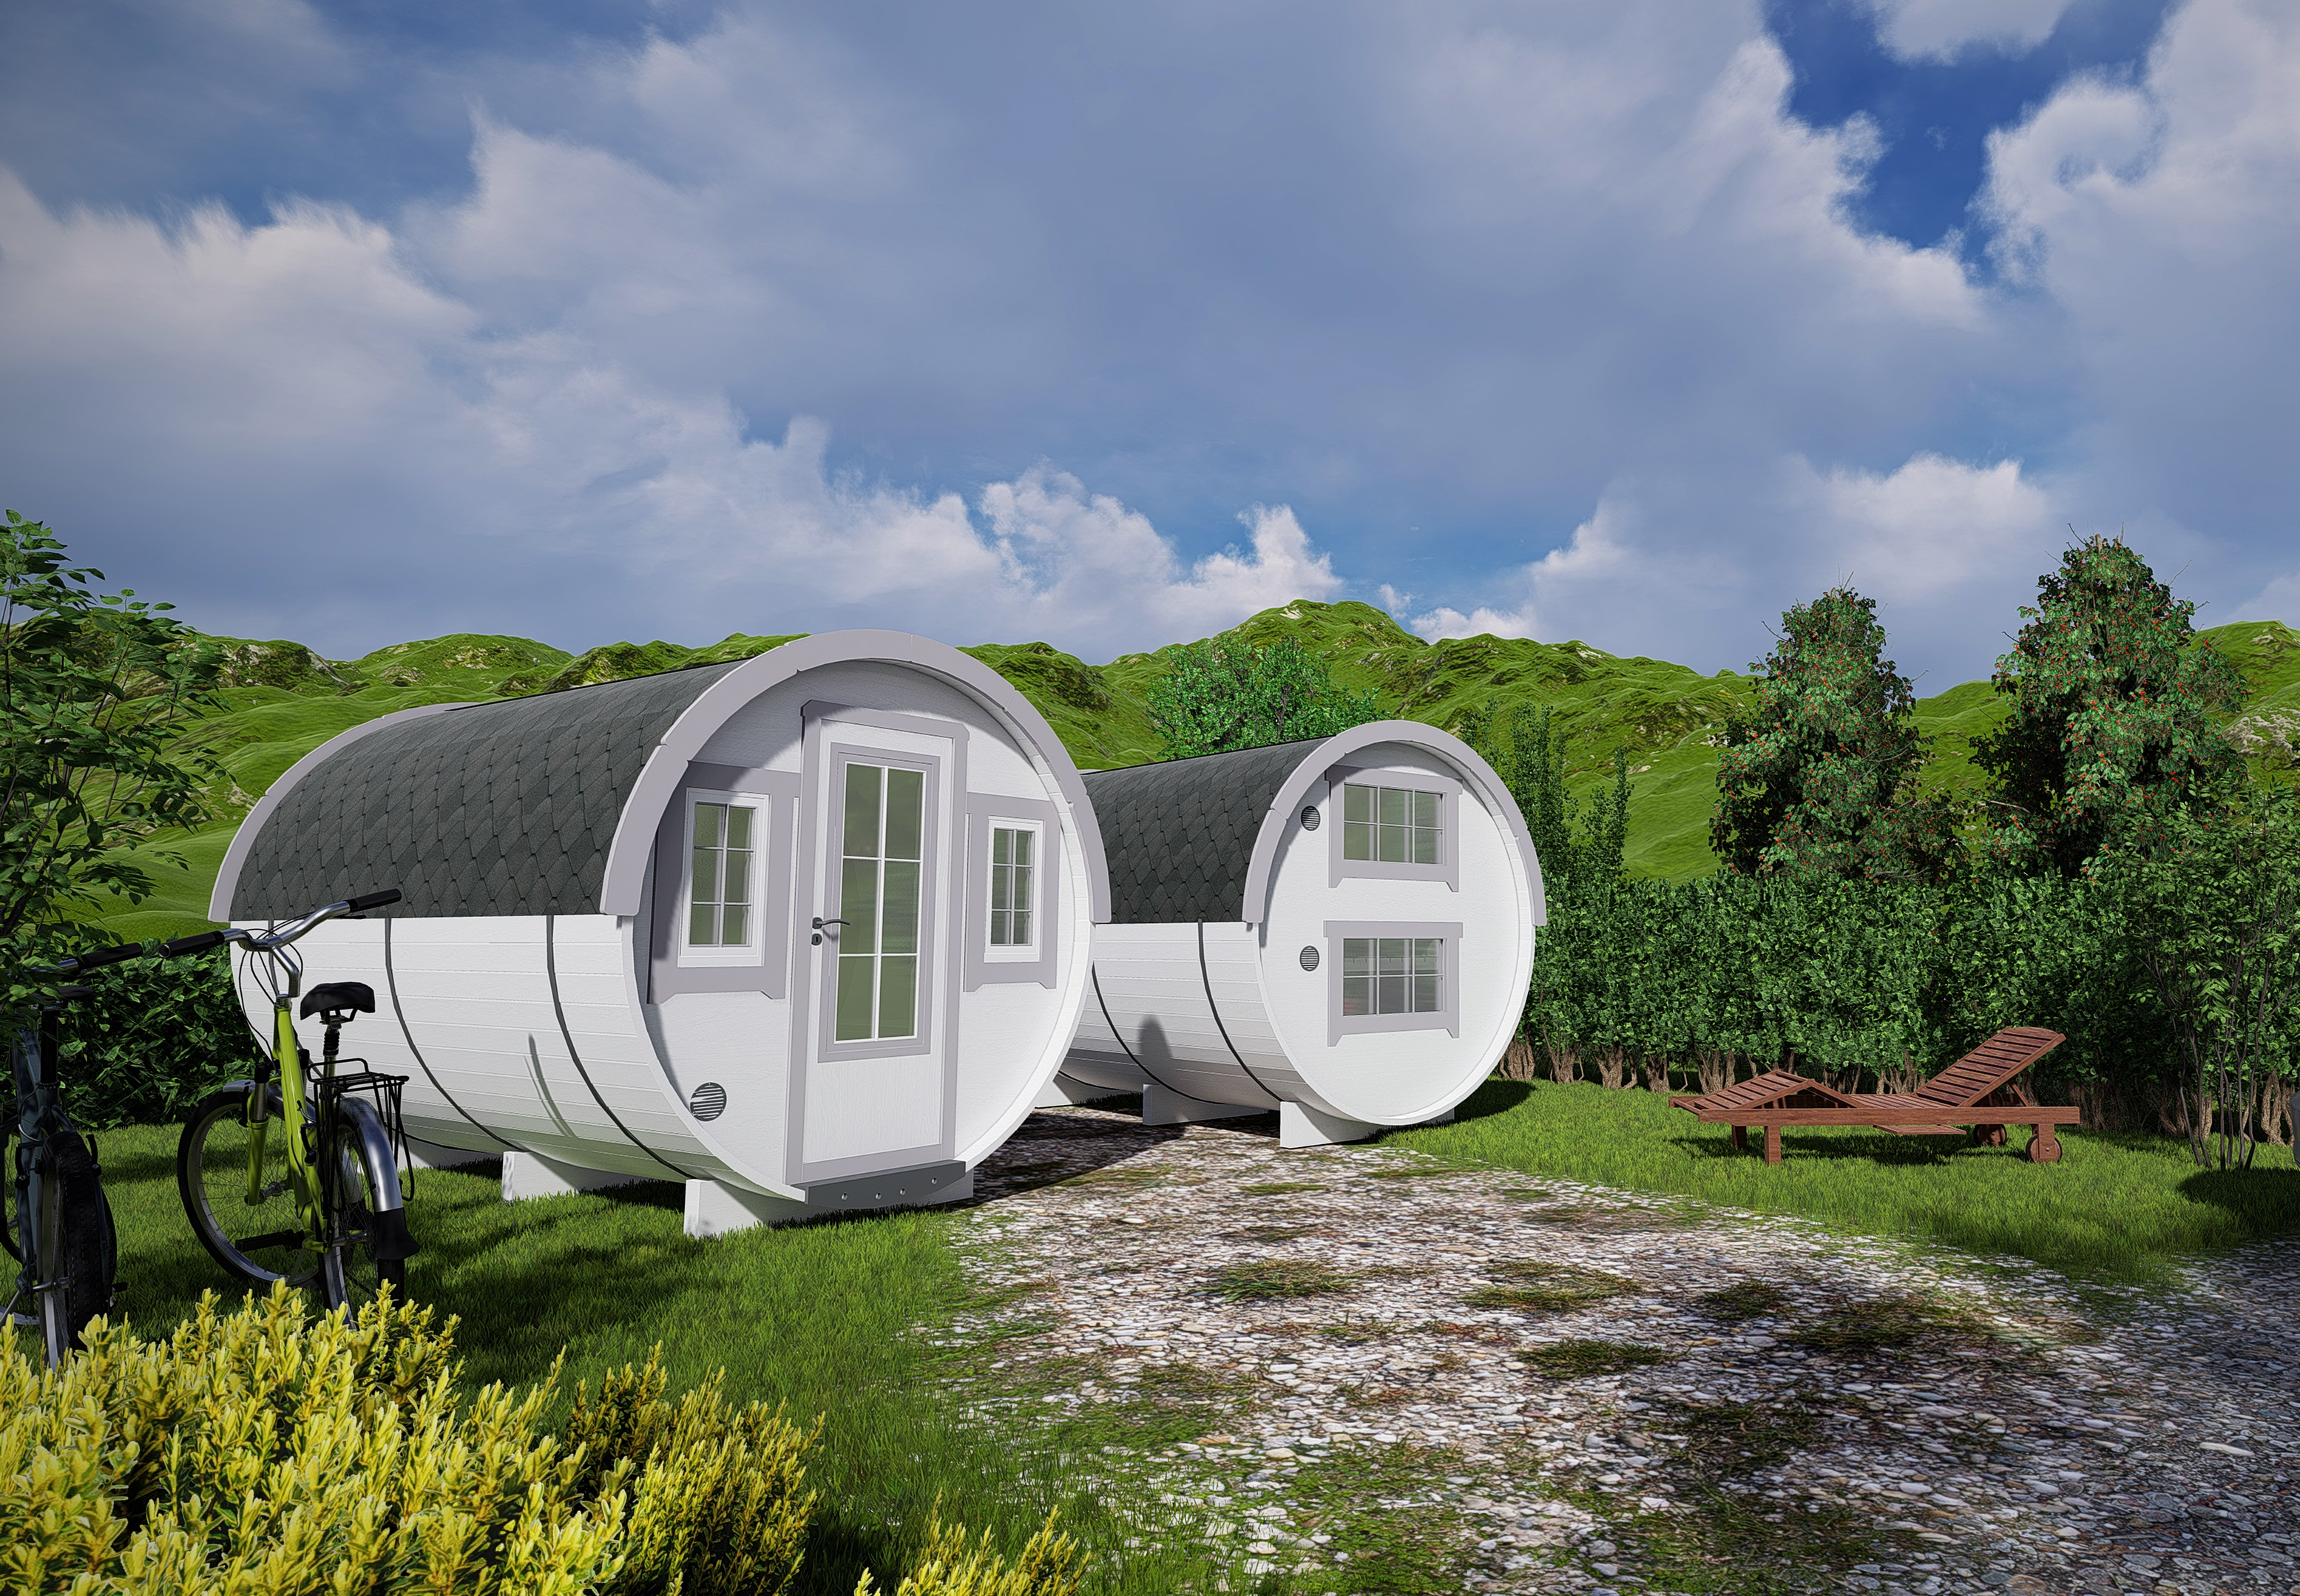 Lot 18003 - V Brand New 2.2 x 3.3m Barrel For Sleeping - Sleeping & Sitting Rooms Inside - Sleeping Room With